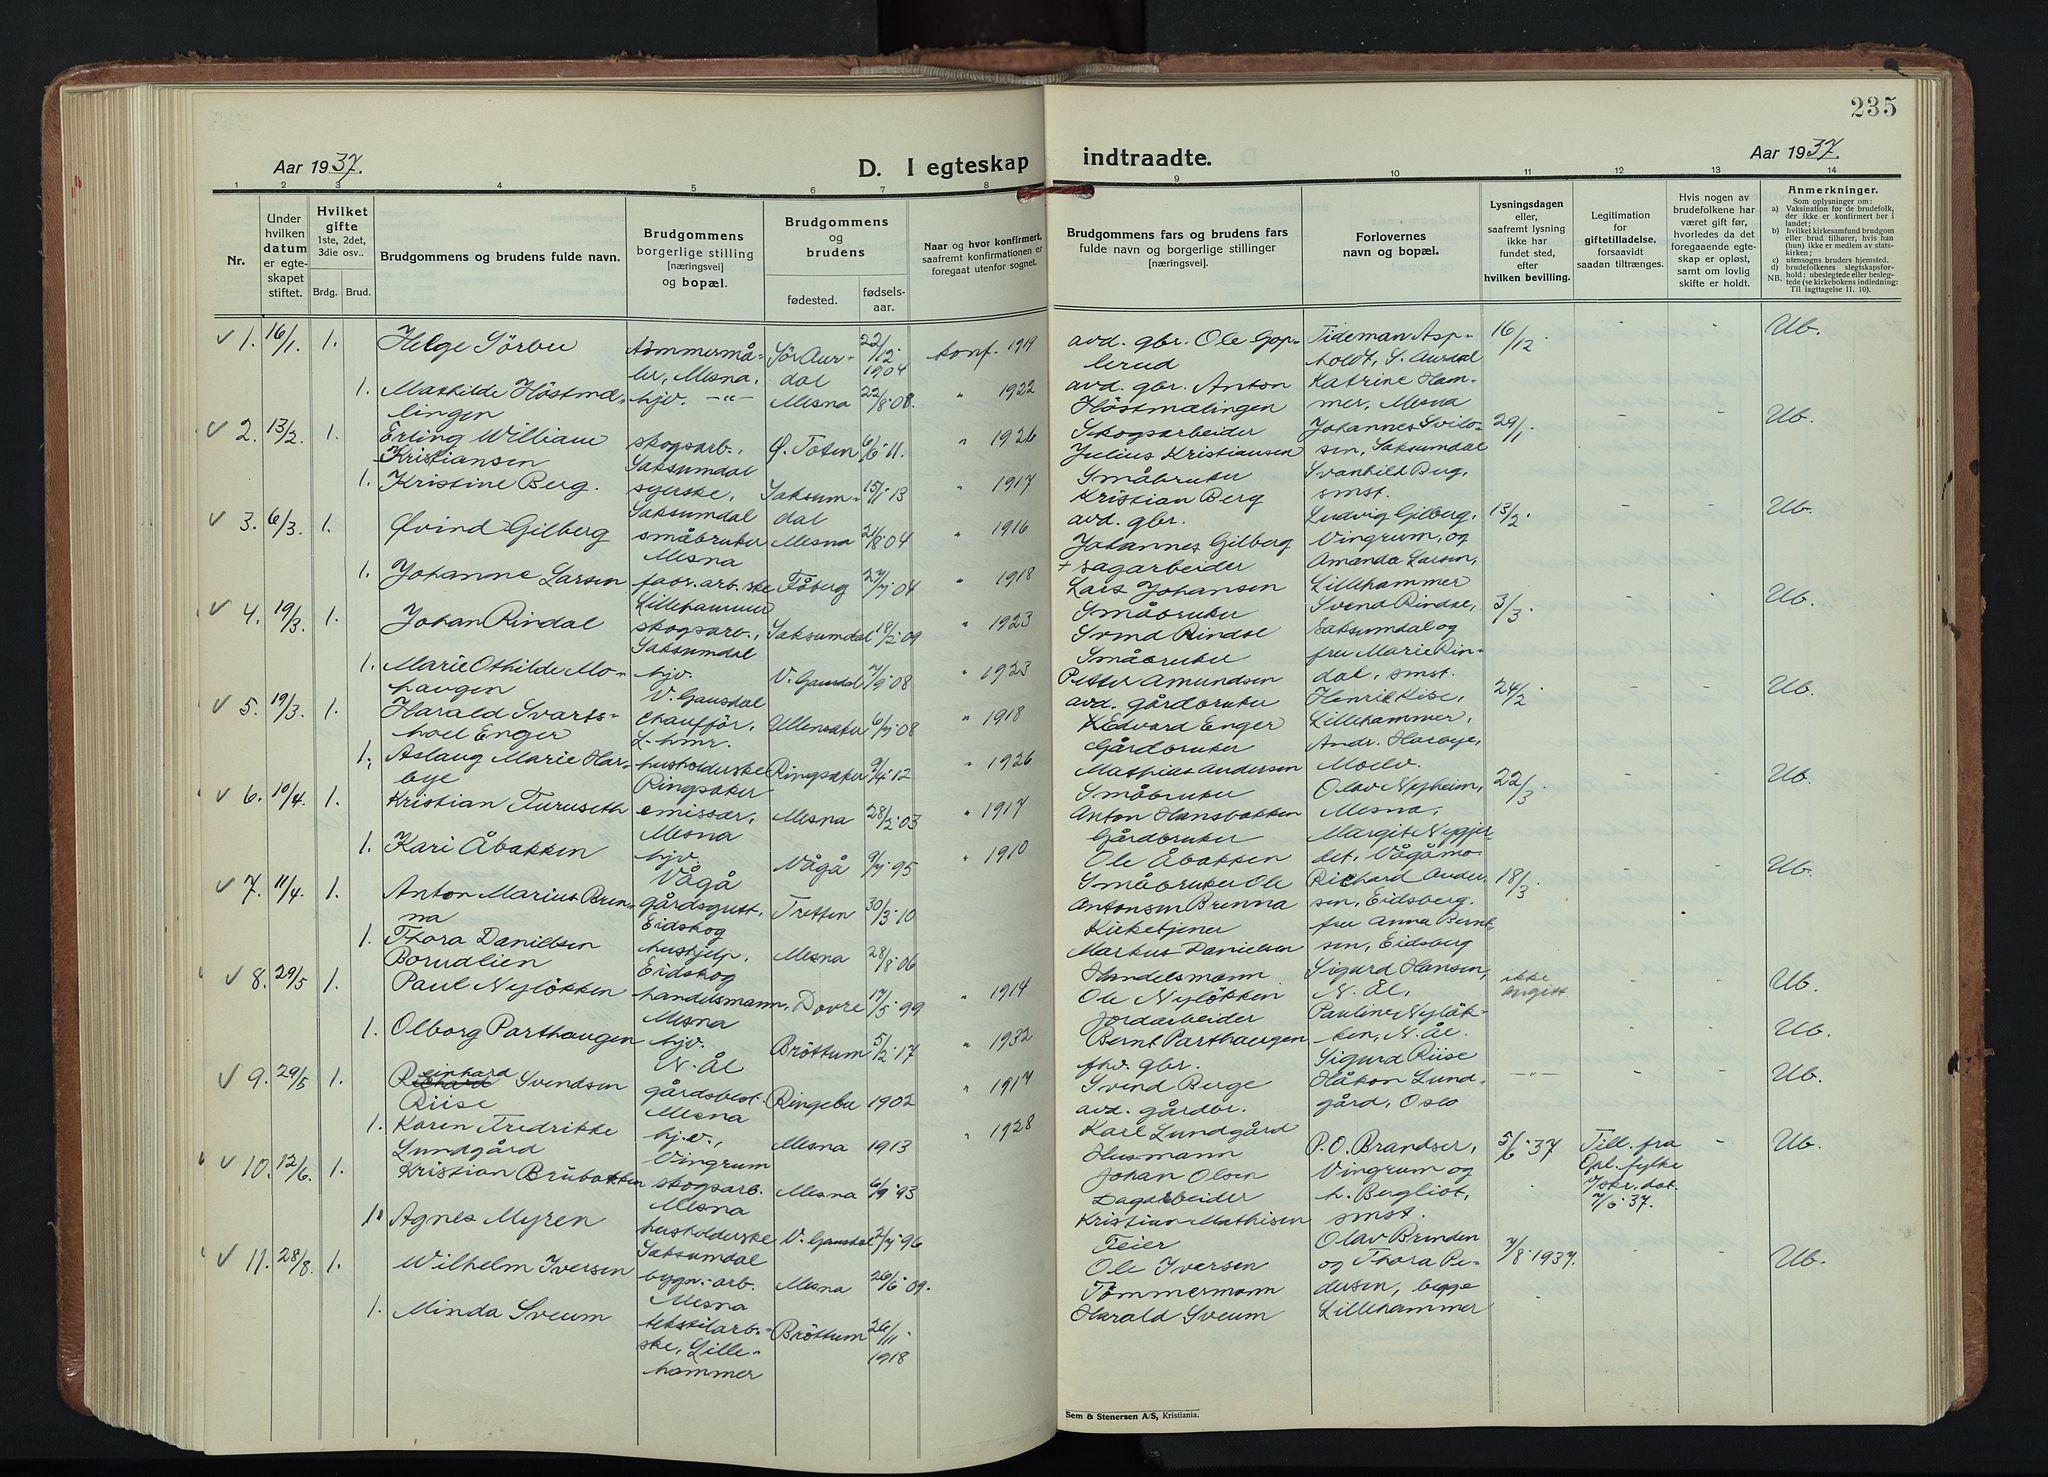 SAH, Fåberg prestekontor, Klokkerbok nr. 15, 1924-1949, s. 235